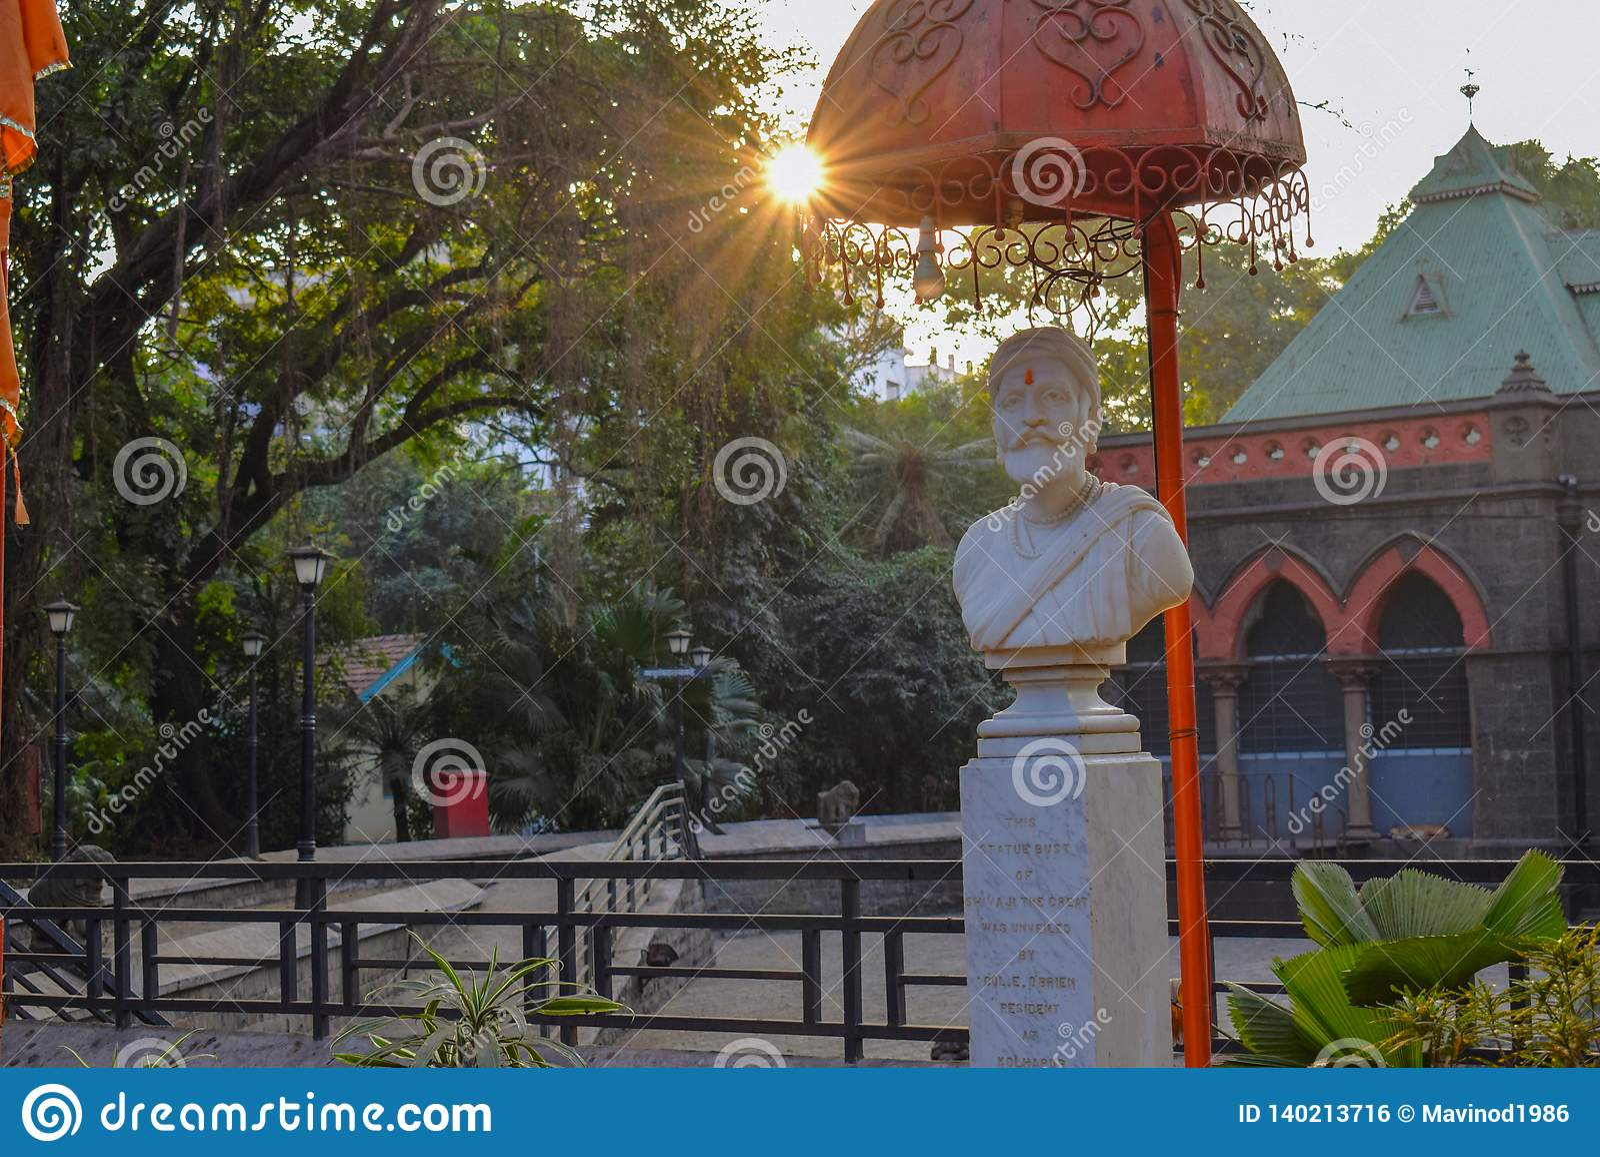 King of maharashtra chattrapathi shivaji Maharaj